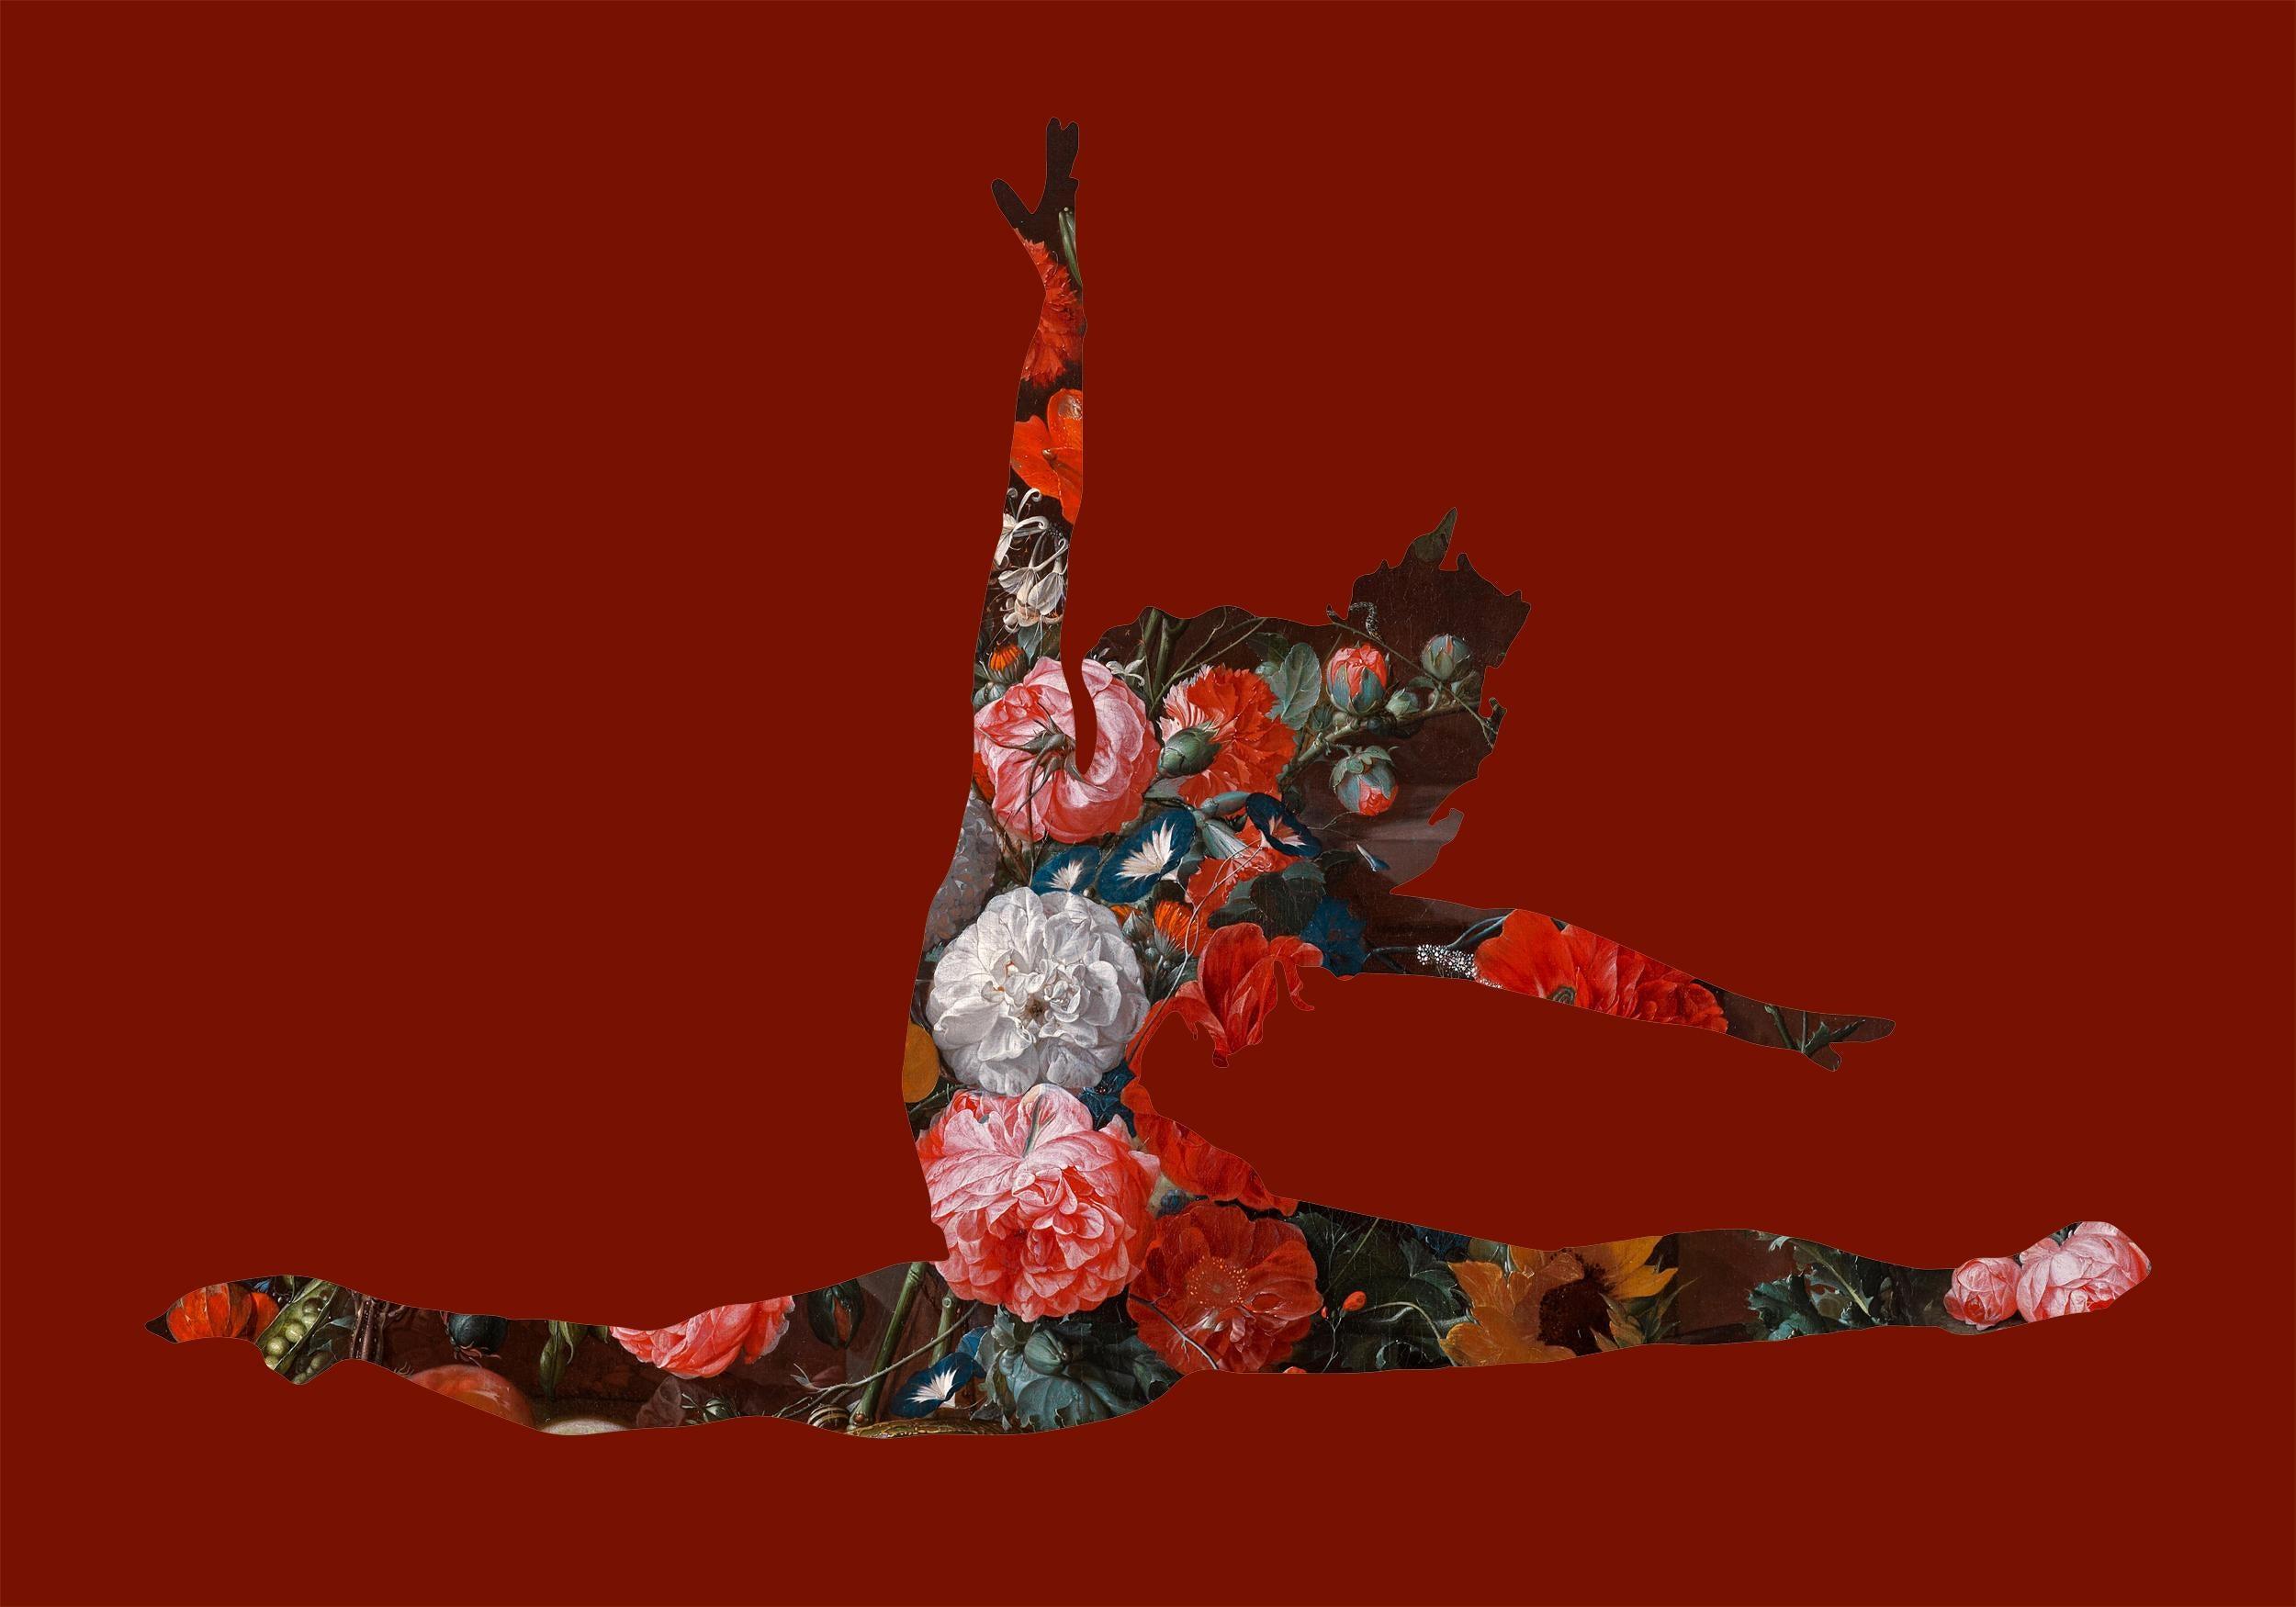 Grand Jetes avec des fleurs (Red) - Ballerina by Agent X